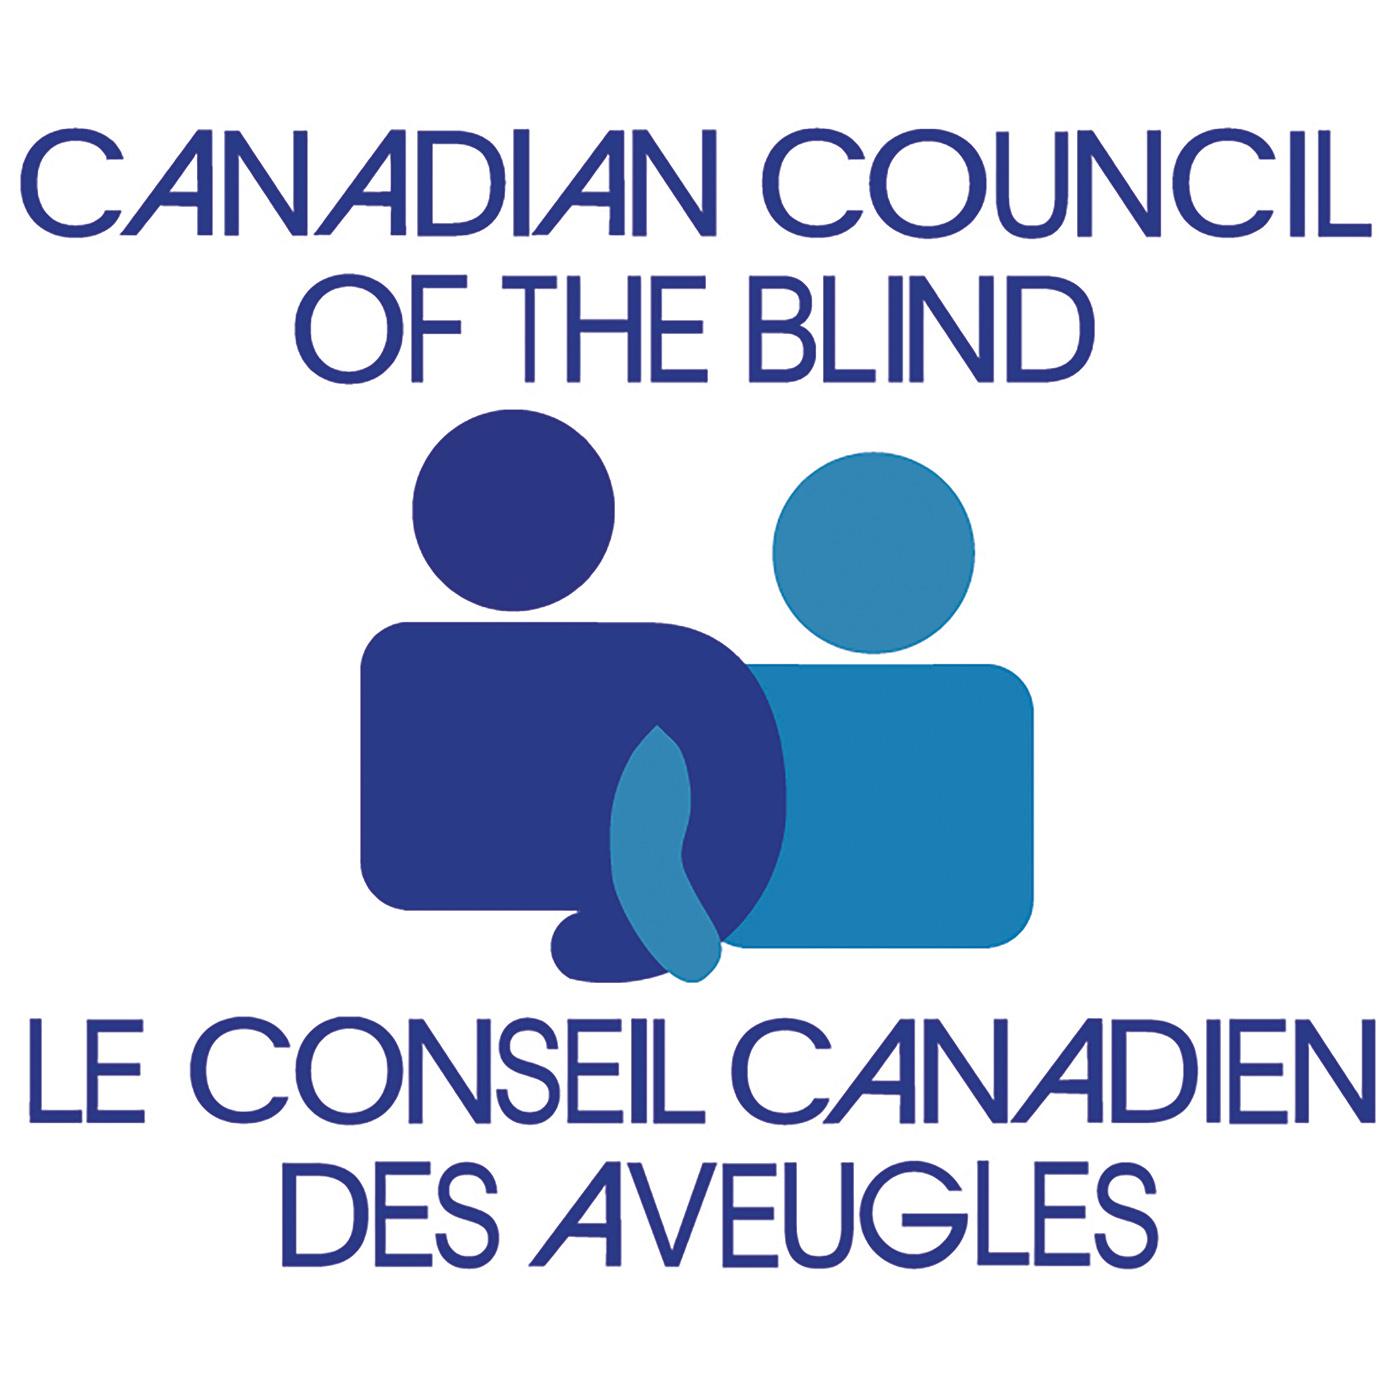 Canadian Council of the Blind. Le conseil Canadien des aveugles